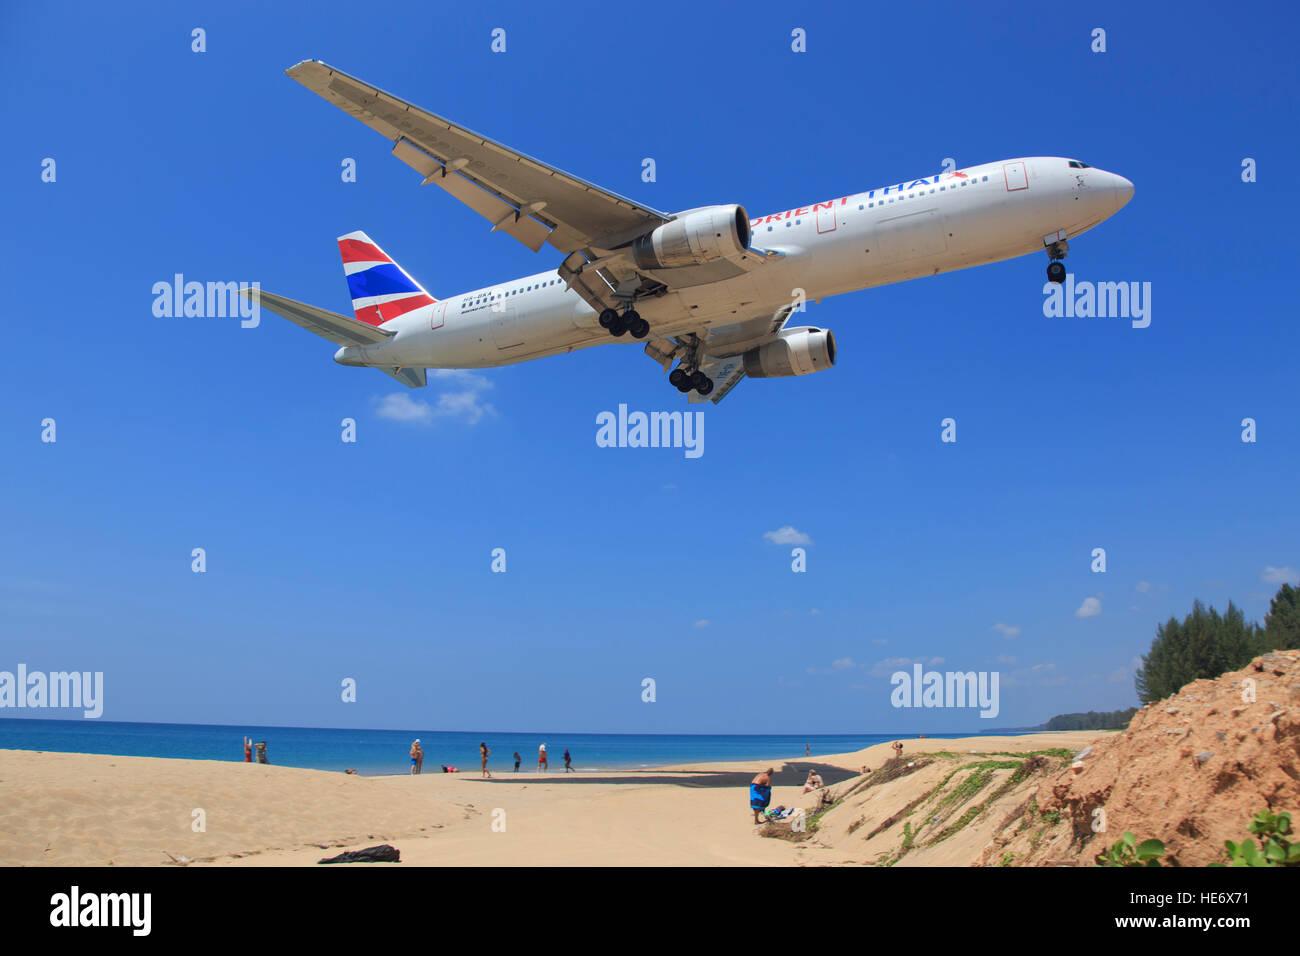 Phuket/thailand Februar 10, 2015: Boeing 767 from Buisness Air landing at Phuket Airport. - Stock Image